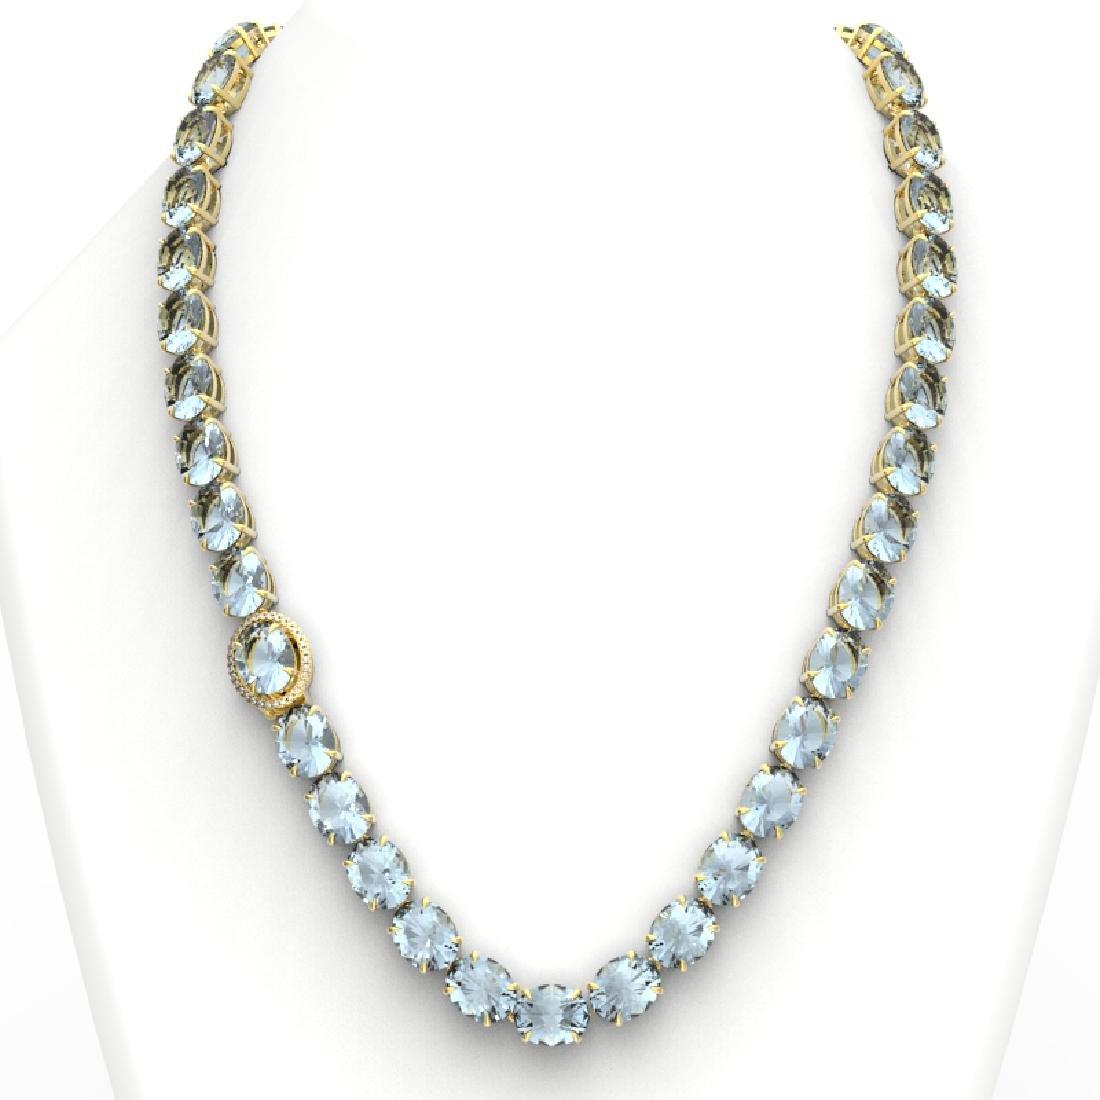 136 CTW Aquamarine & VS/SI Diamond Necklace 14K Yellow - 3